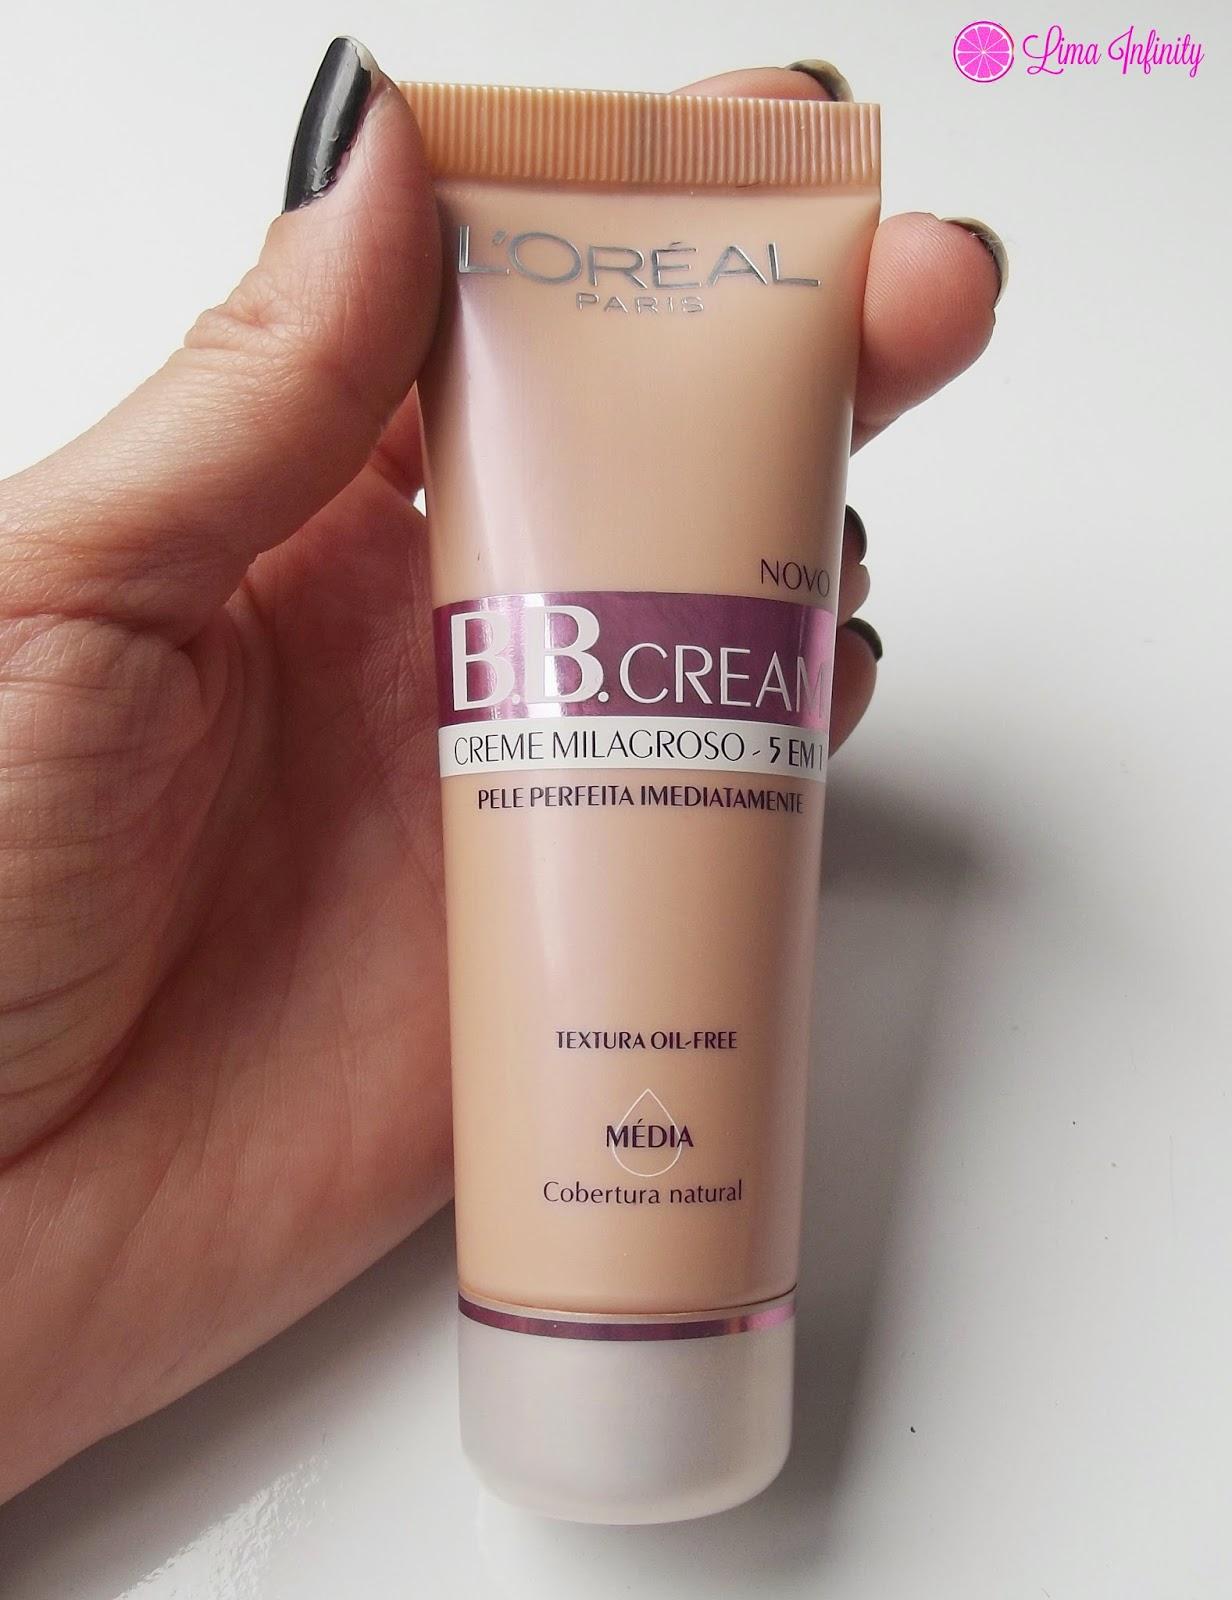 bbcream-l'oréal-resenha-cor-média